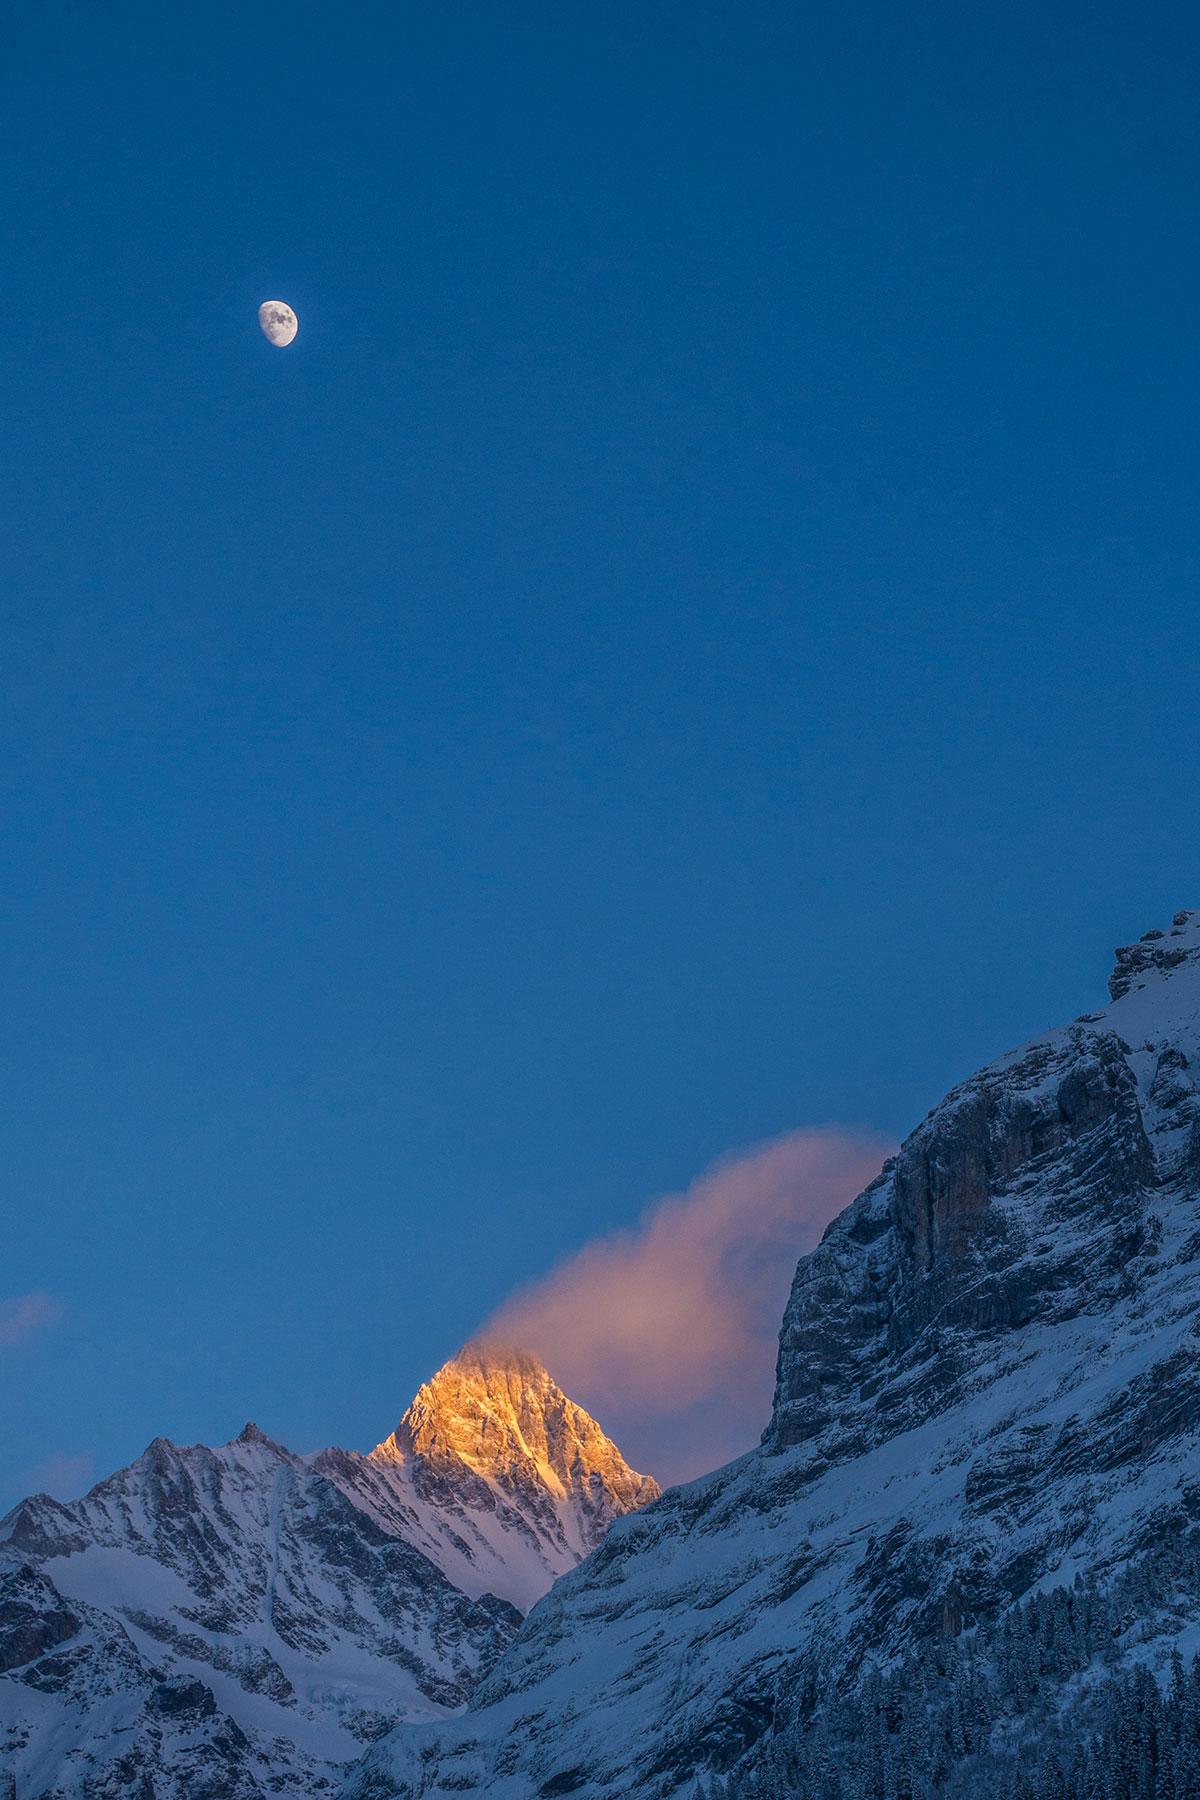 Schreckhorn over Grindelwald